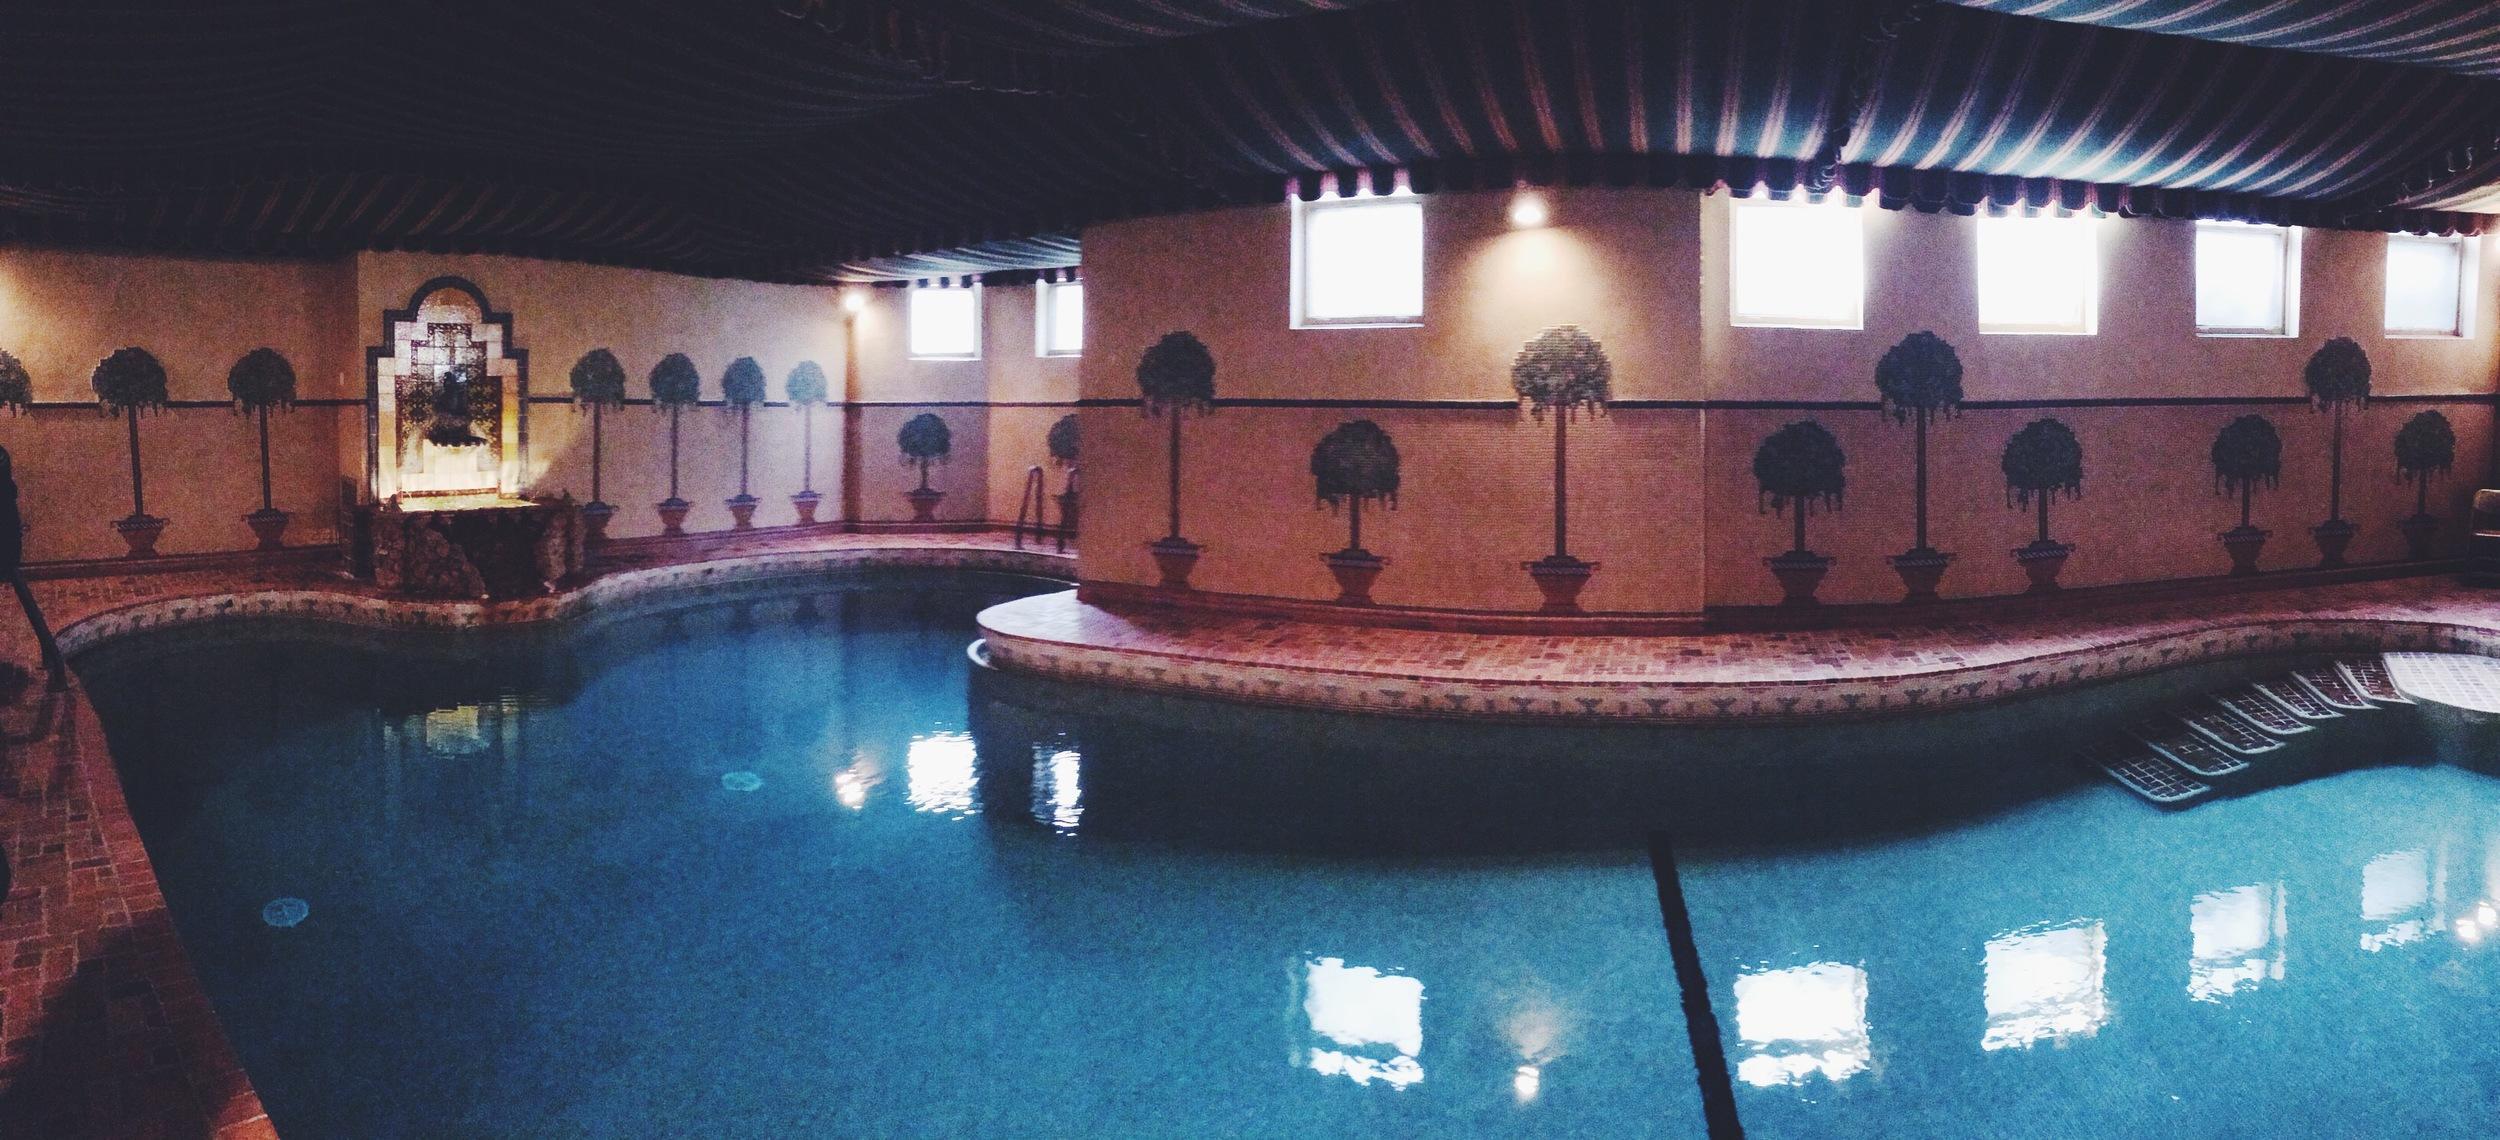 Park Castle's European style swimming pool, circa 1920.